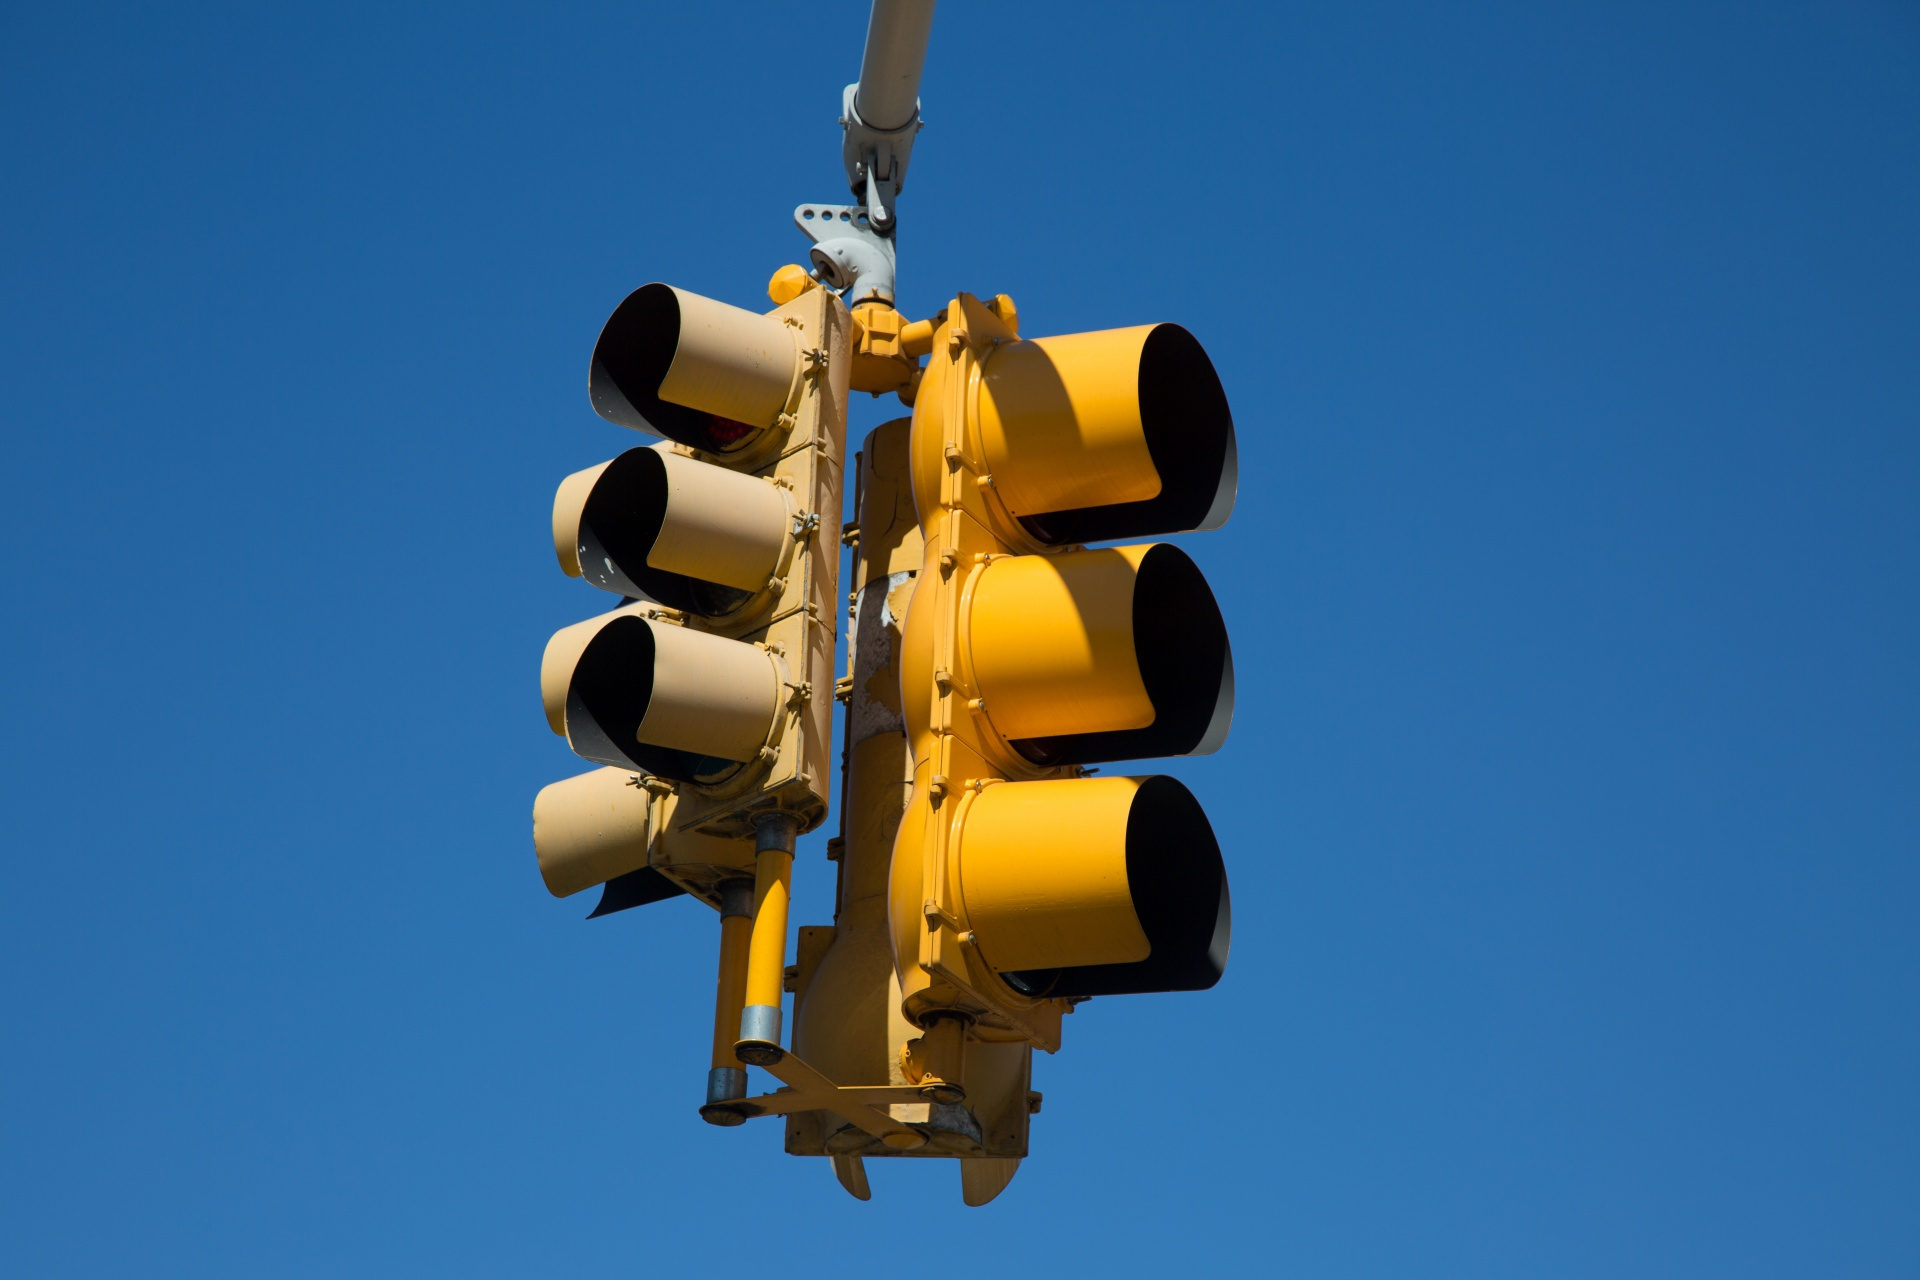 OH YES unplug traffic-light